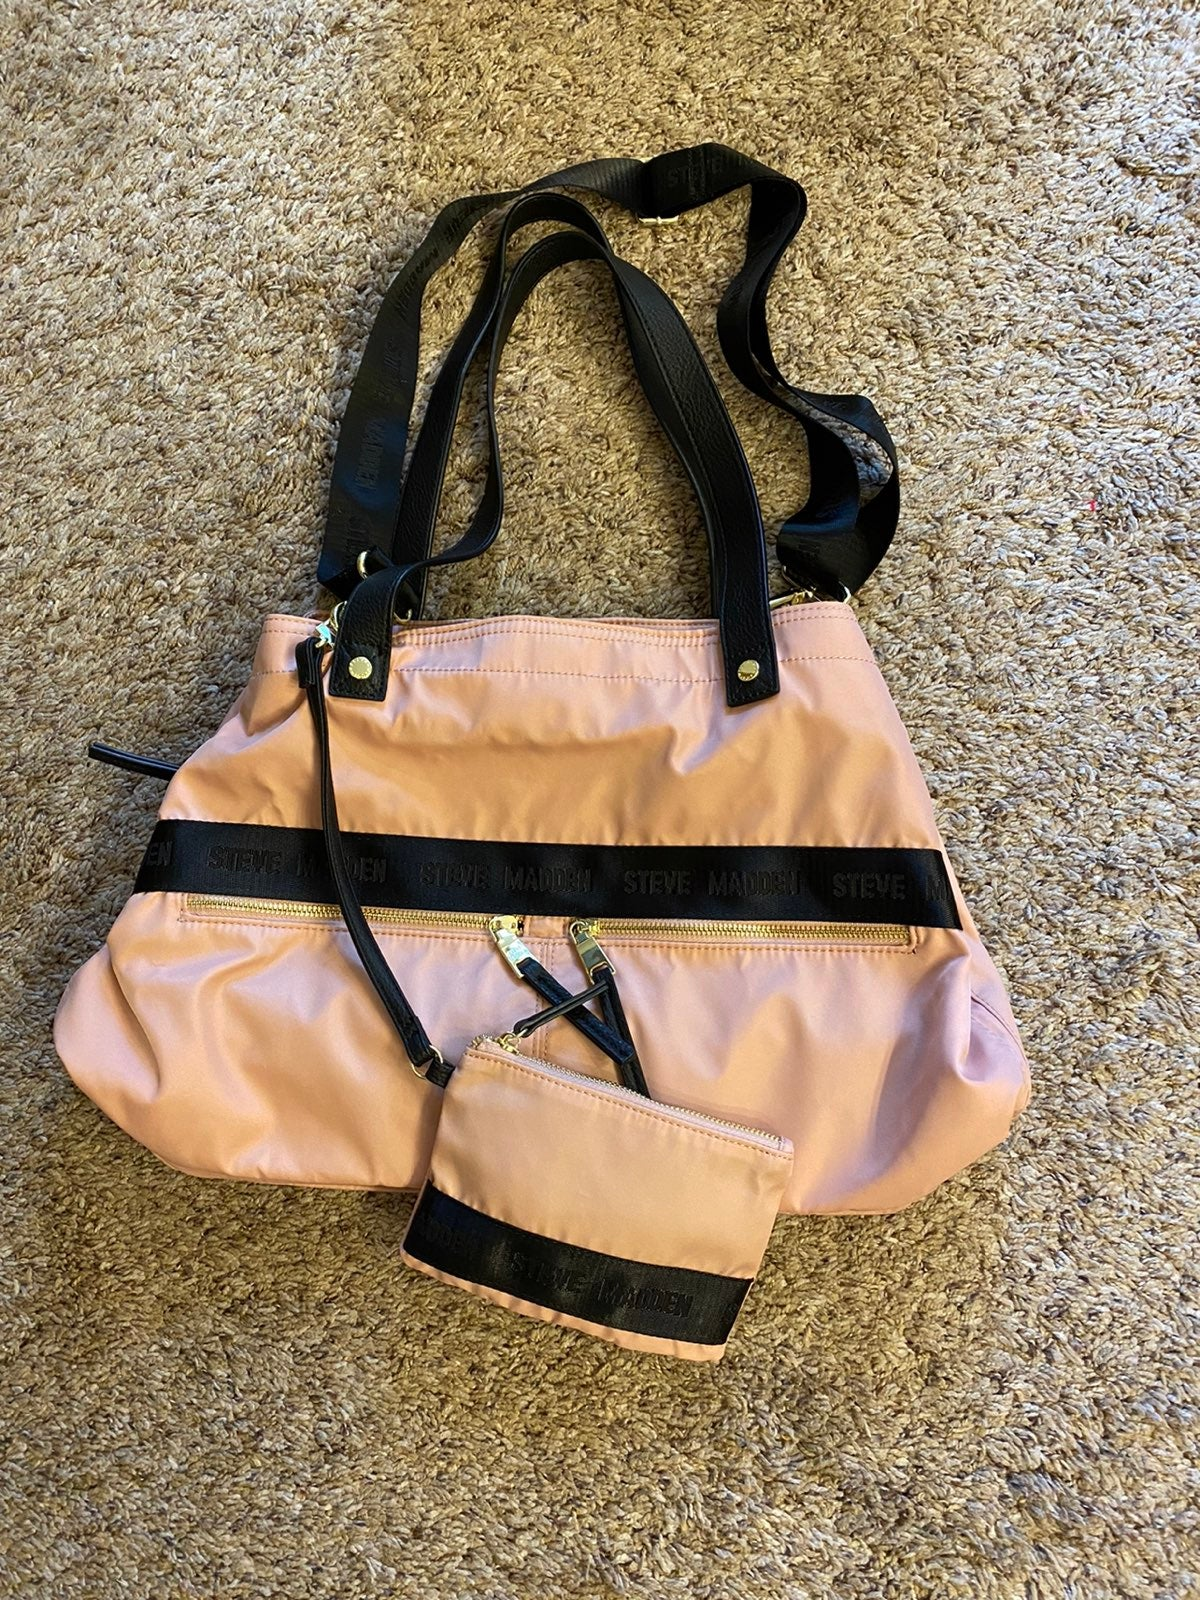 Steve Madden Blush Nylon Tote Bag